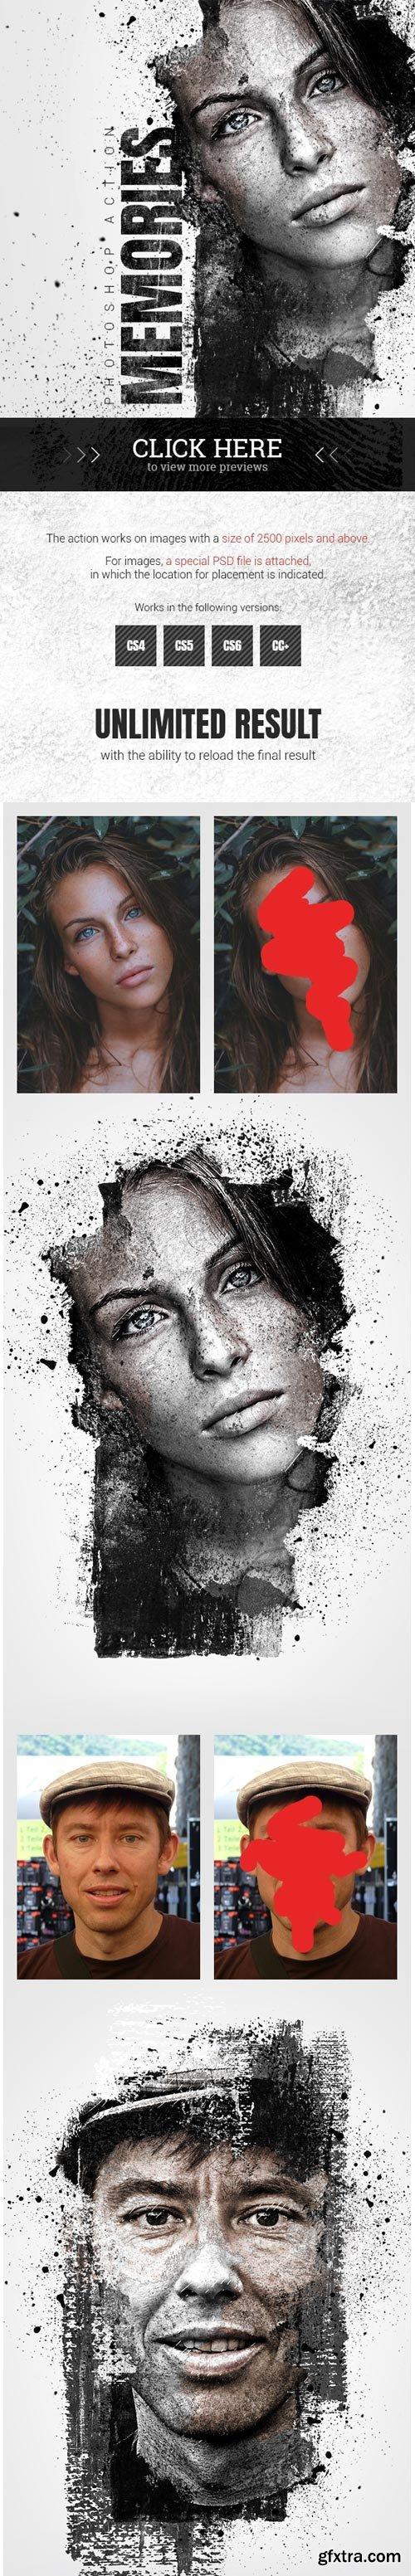 GraphicRiver - Memories Photoshop Action - 22811596